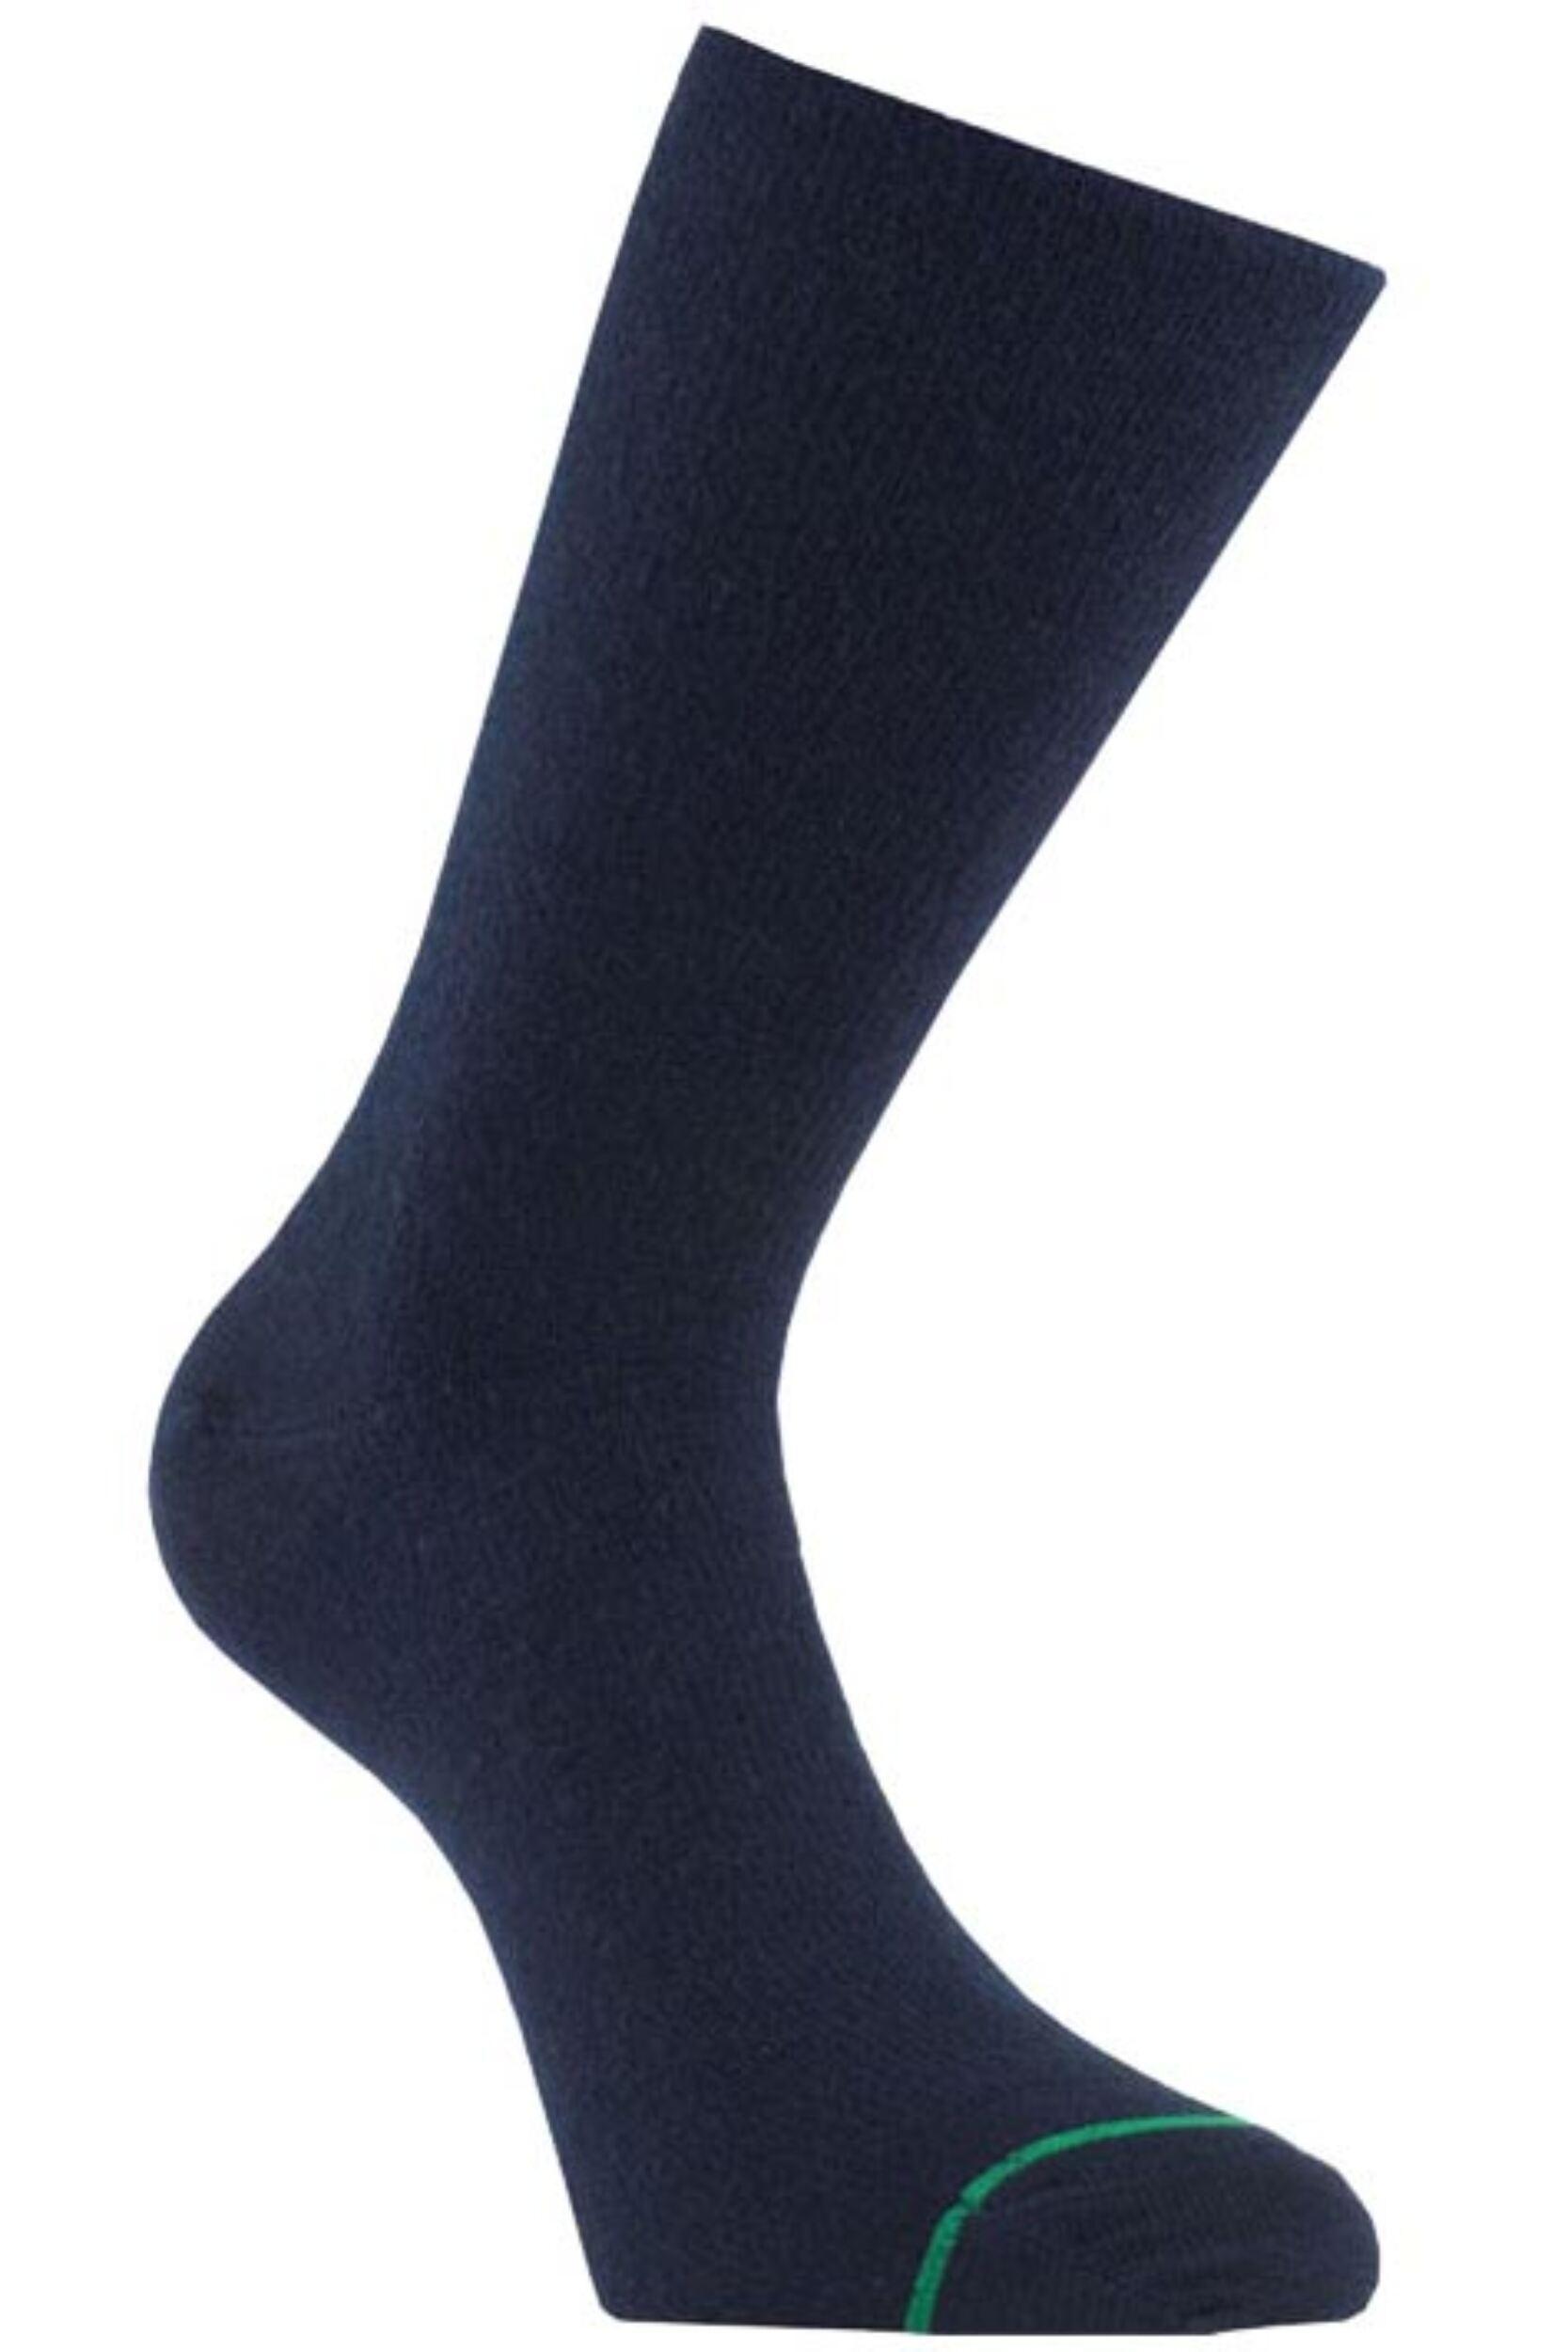 Image of Mens 1 Pair 1000 Mile 'Tactel' Ultimate Light Weight Walking Socks